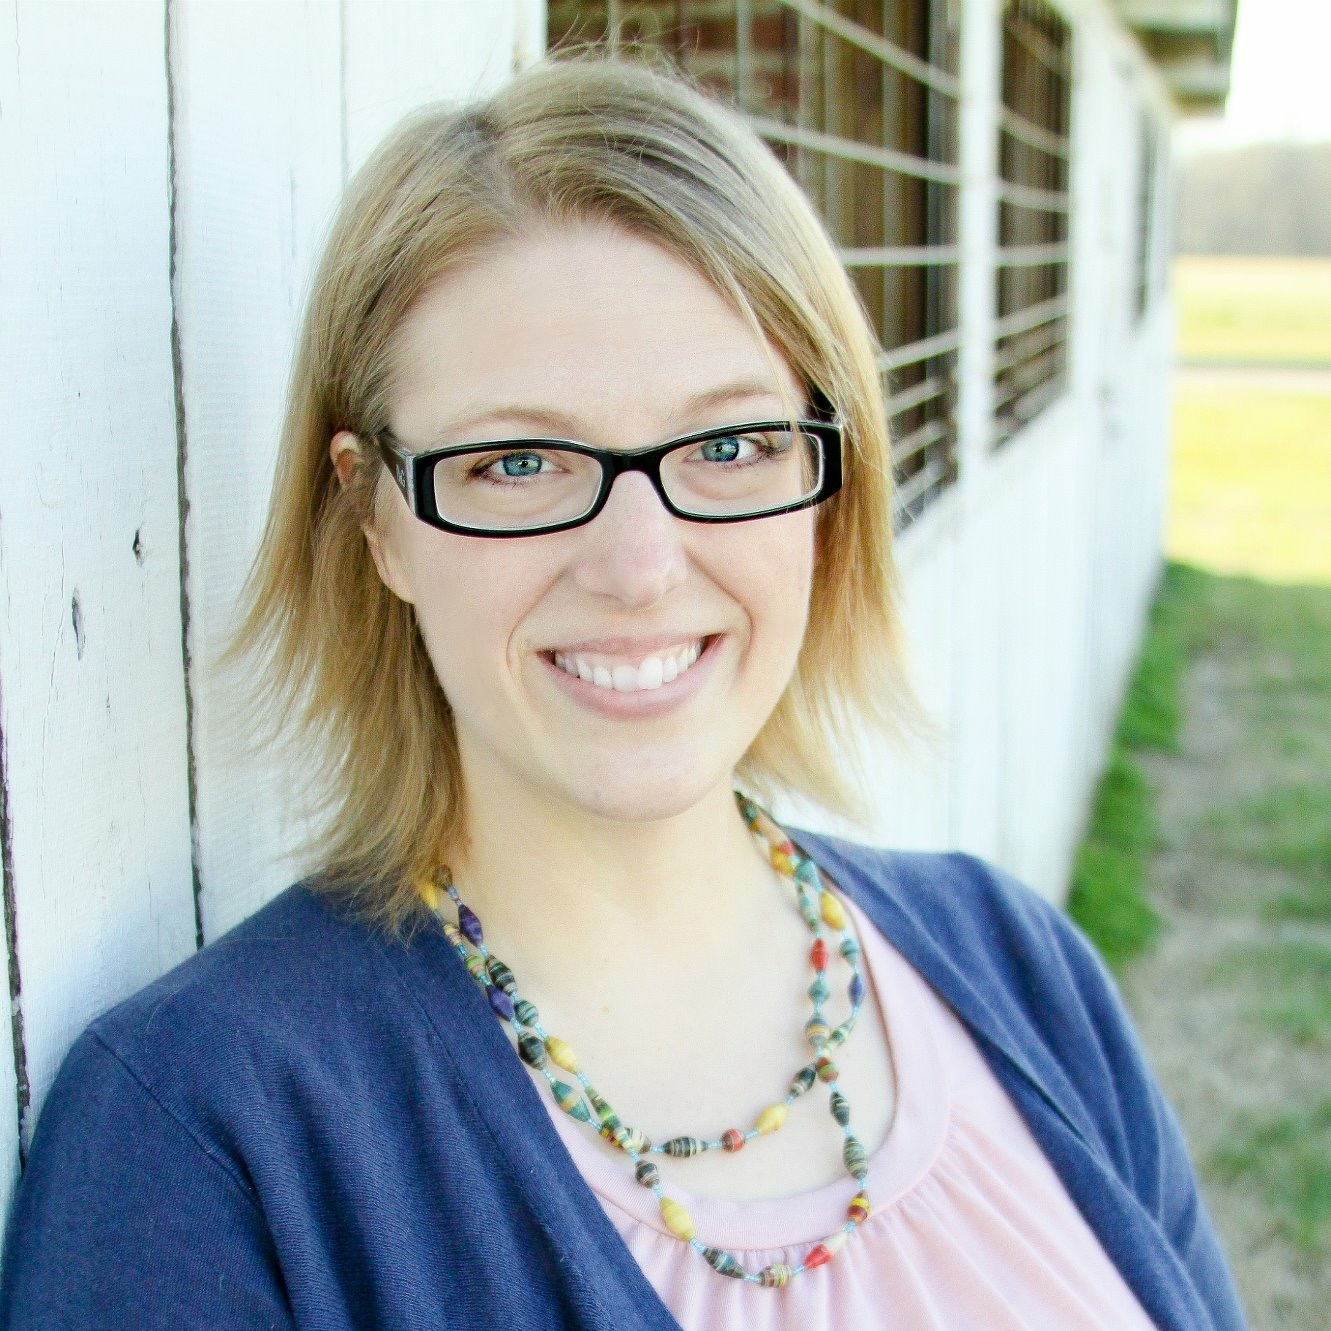 Brenda Davenport - Operations Director - Stateside